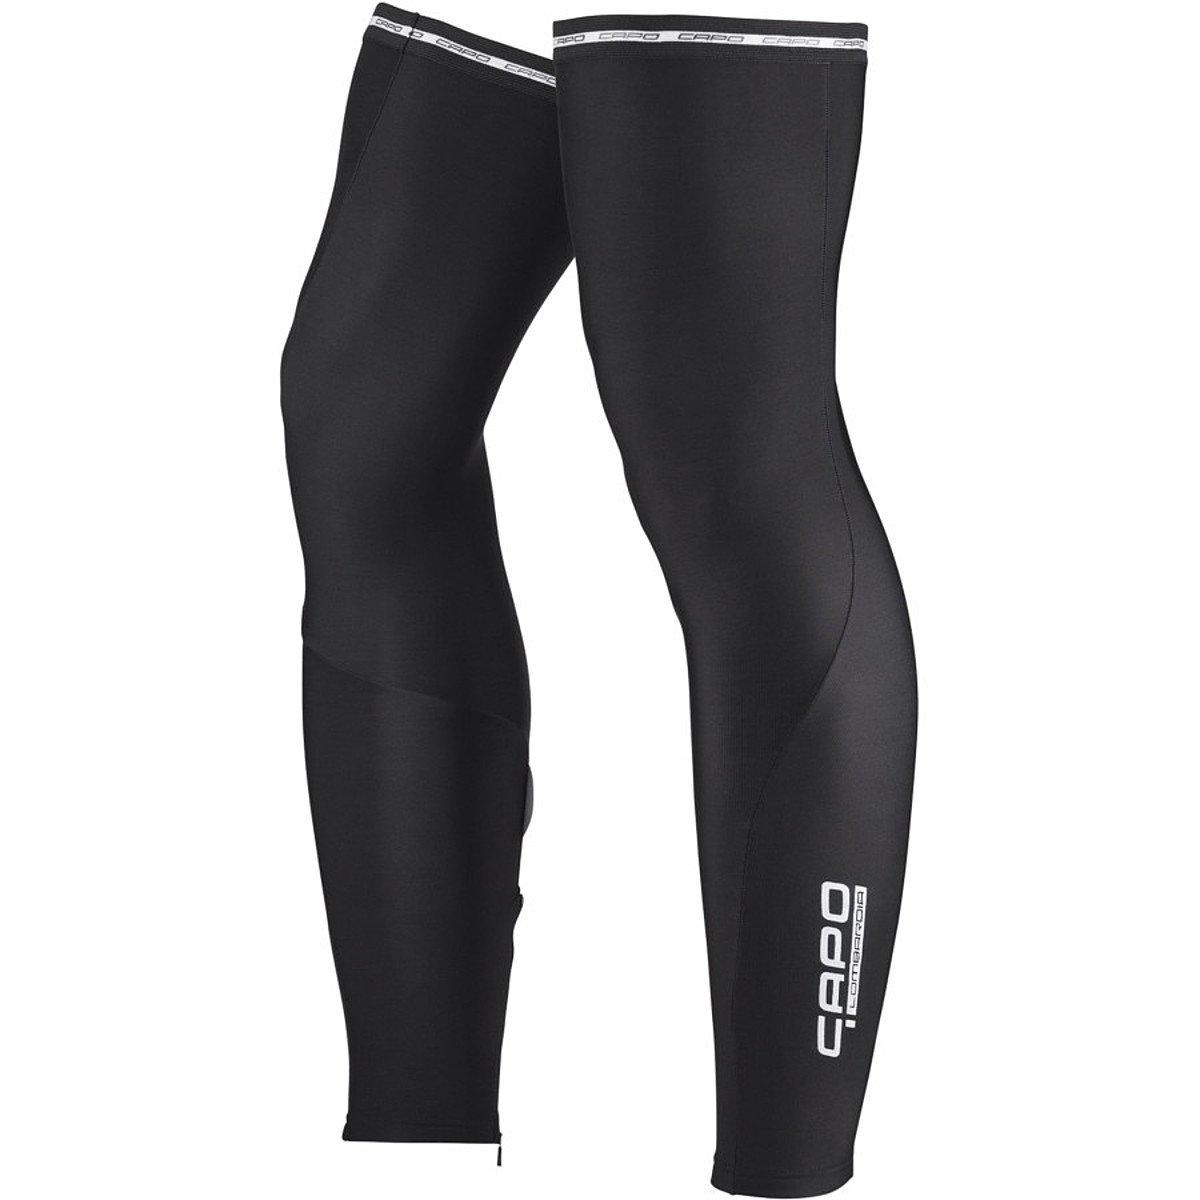 Capo Lombardia Leg Warmer Black, S/M